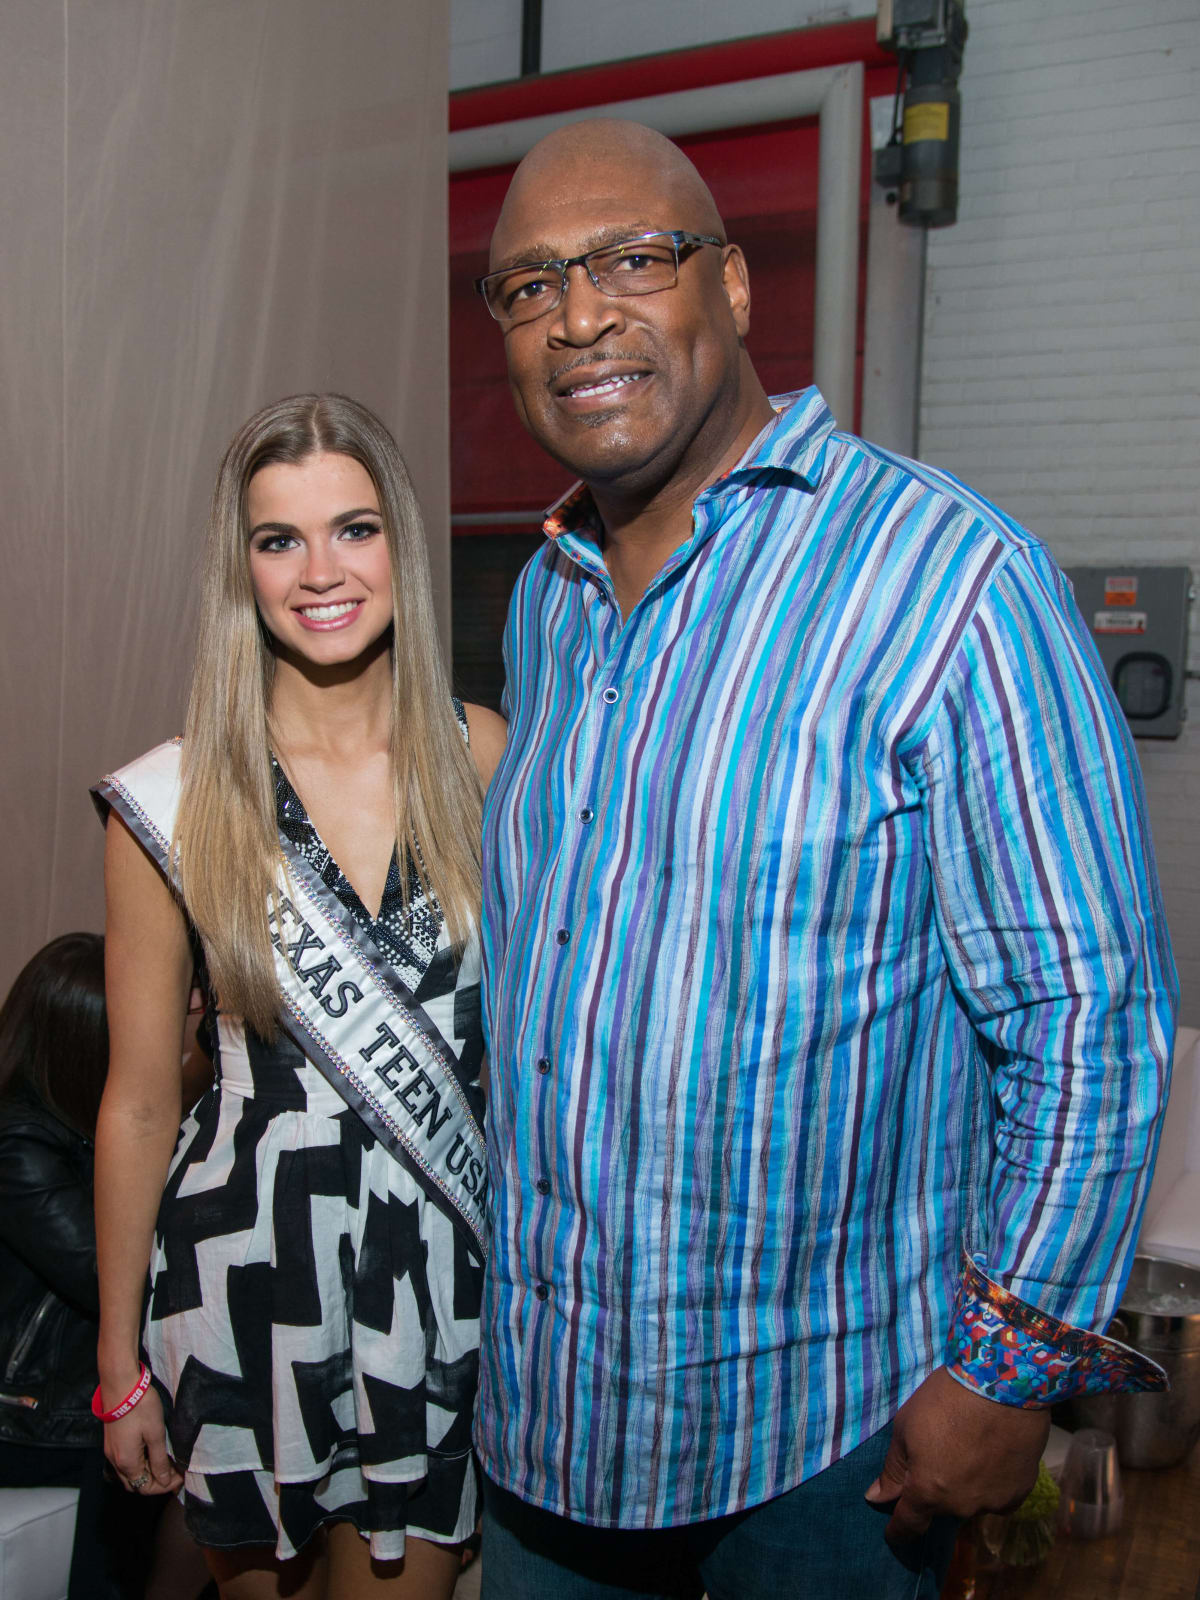 Kirby Lindley, Charles Haley at Big Texas Party